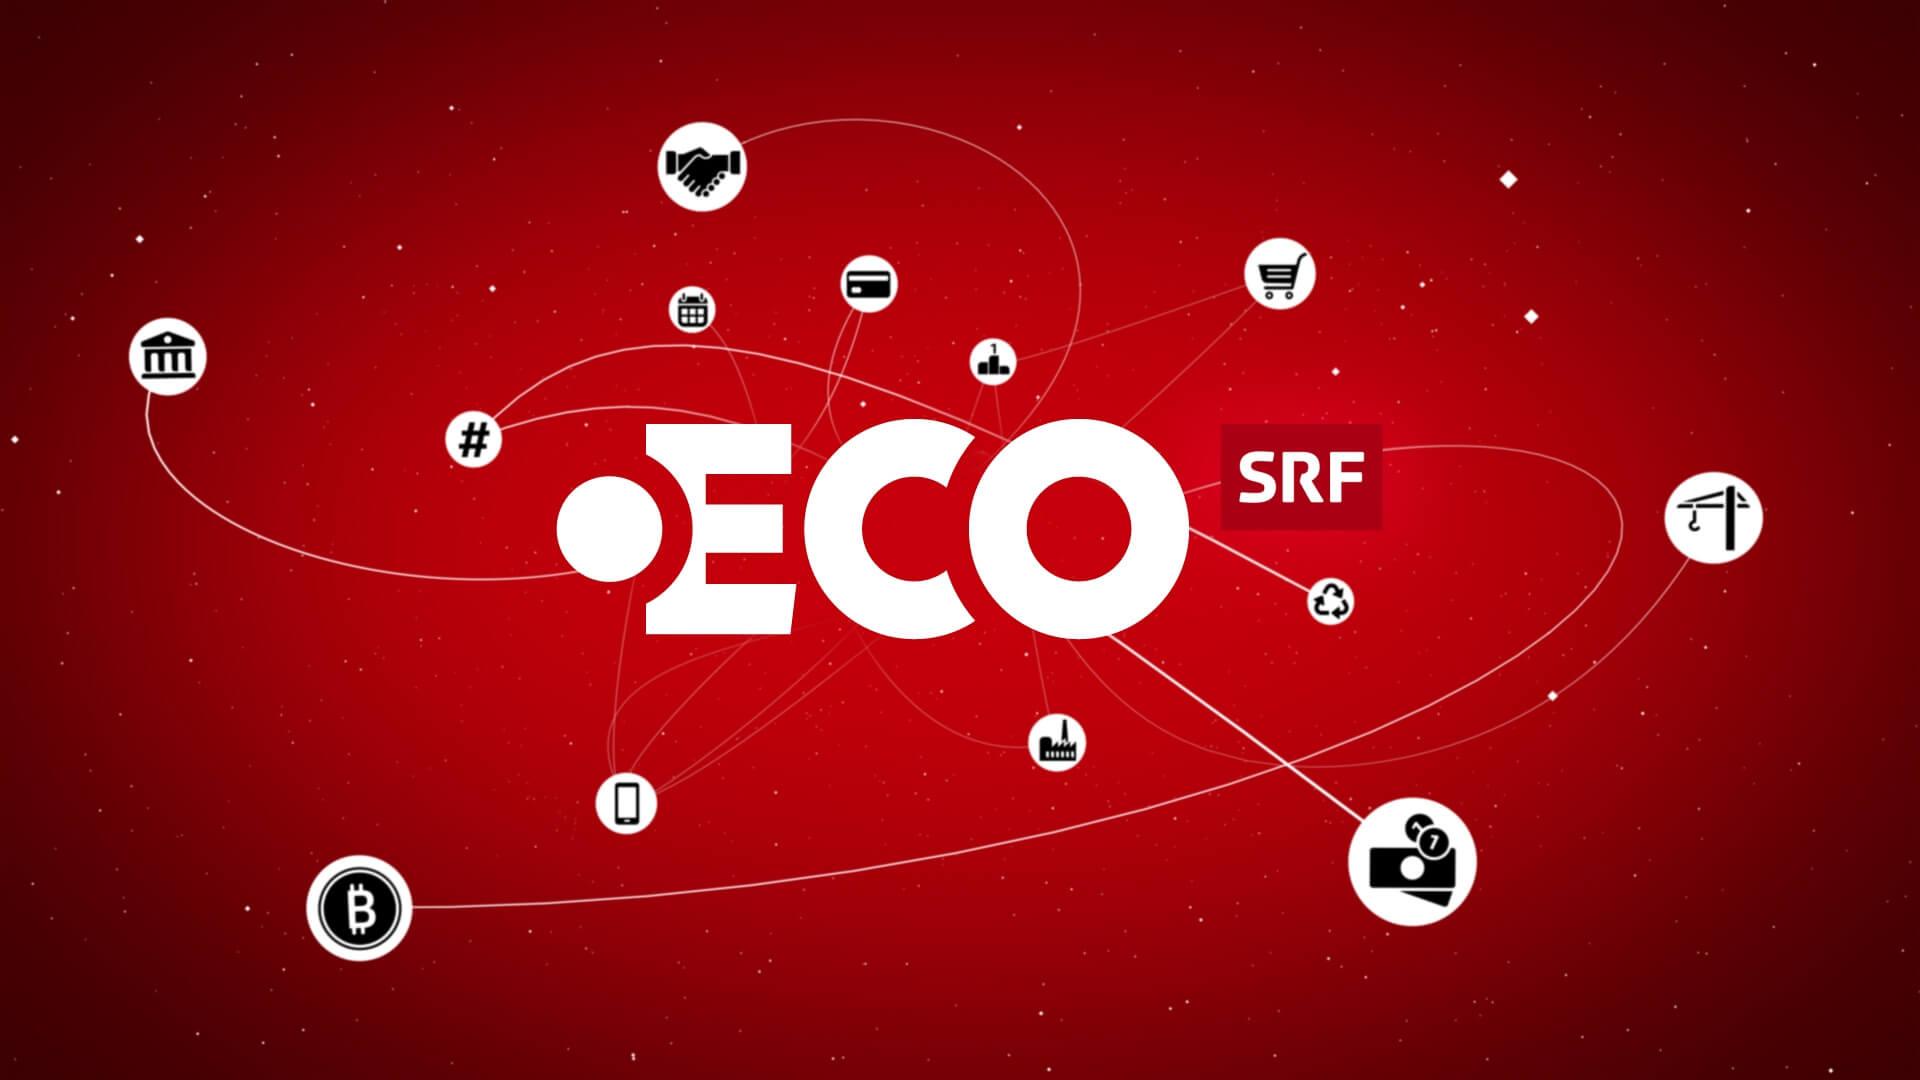 BERHALTER Swiss Die-Cutting im SRF ECO Digitalisierung CUTcontrol™